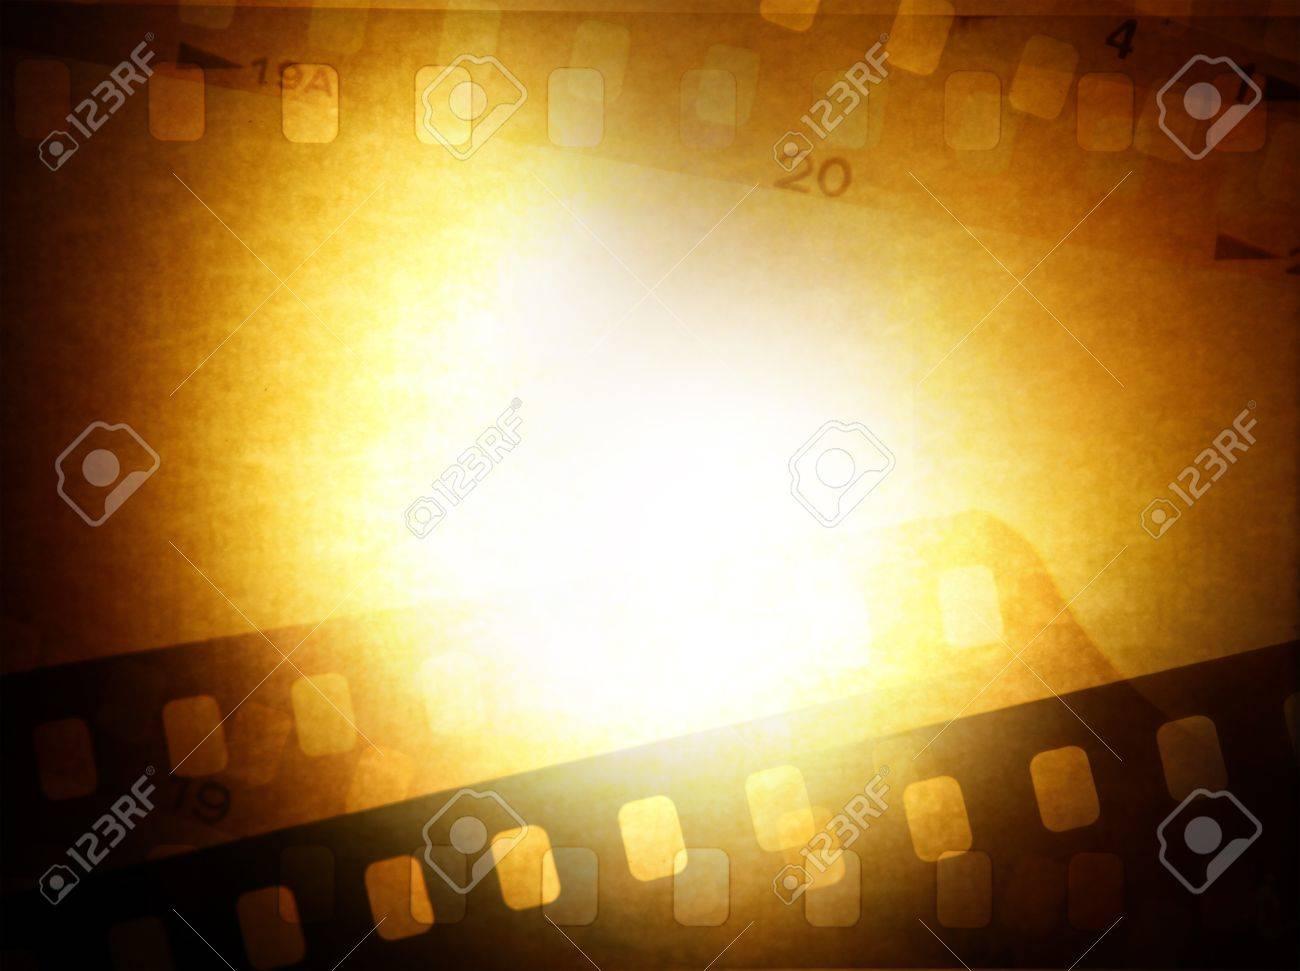 Film negative frames on brown background Stock Photo - 15749513